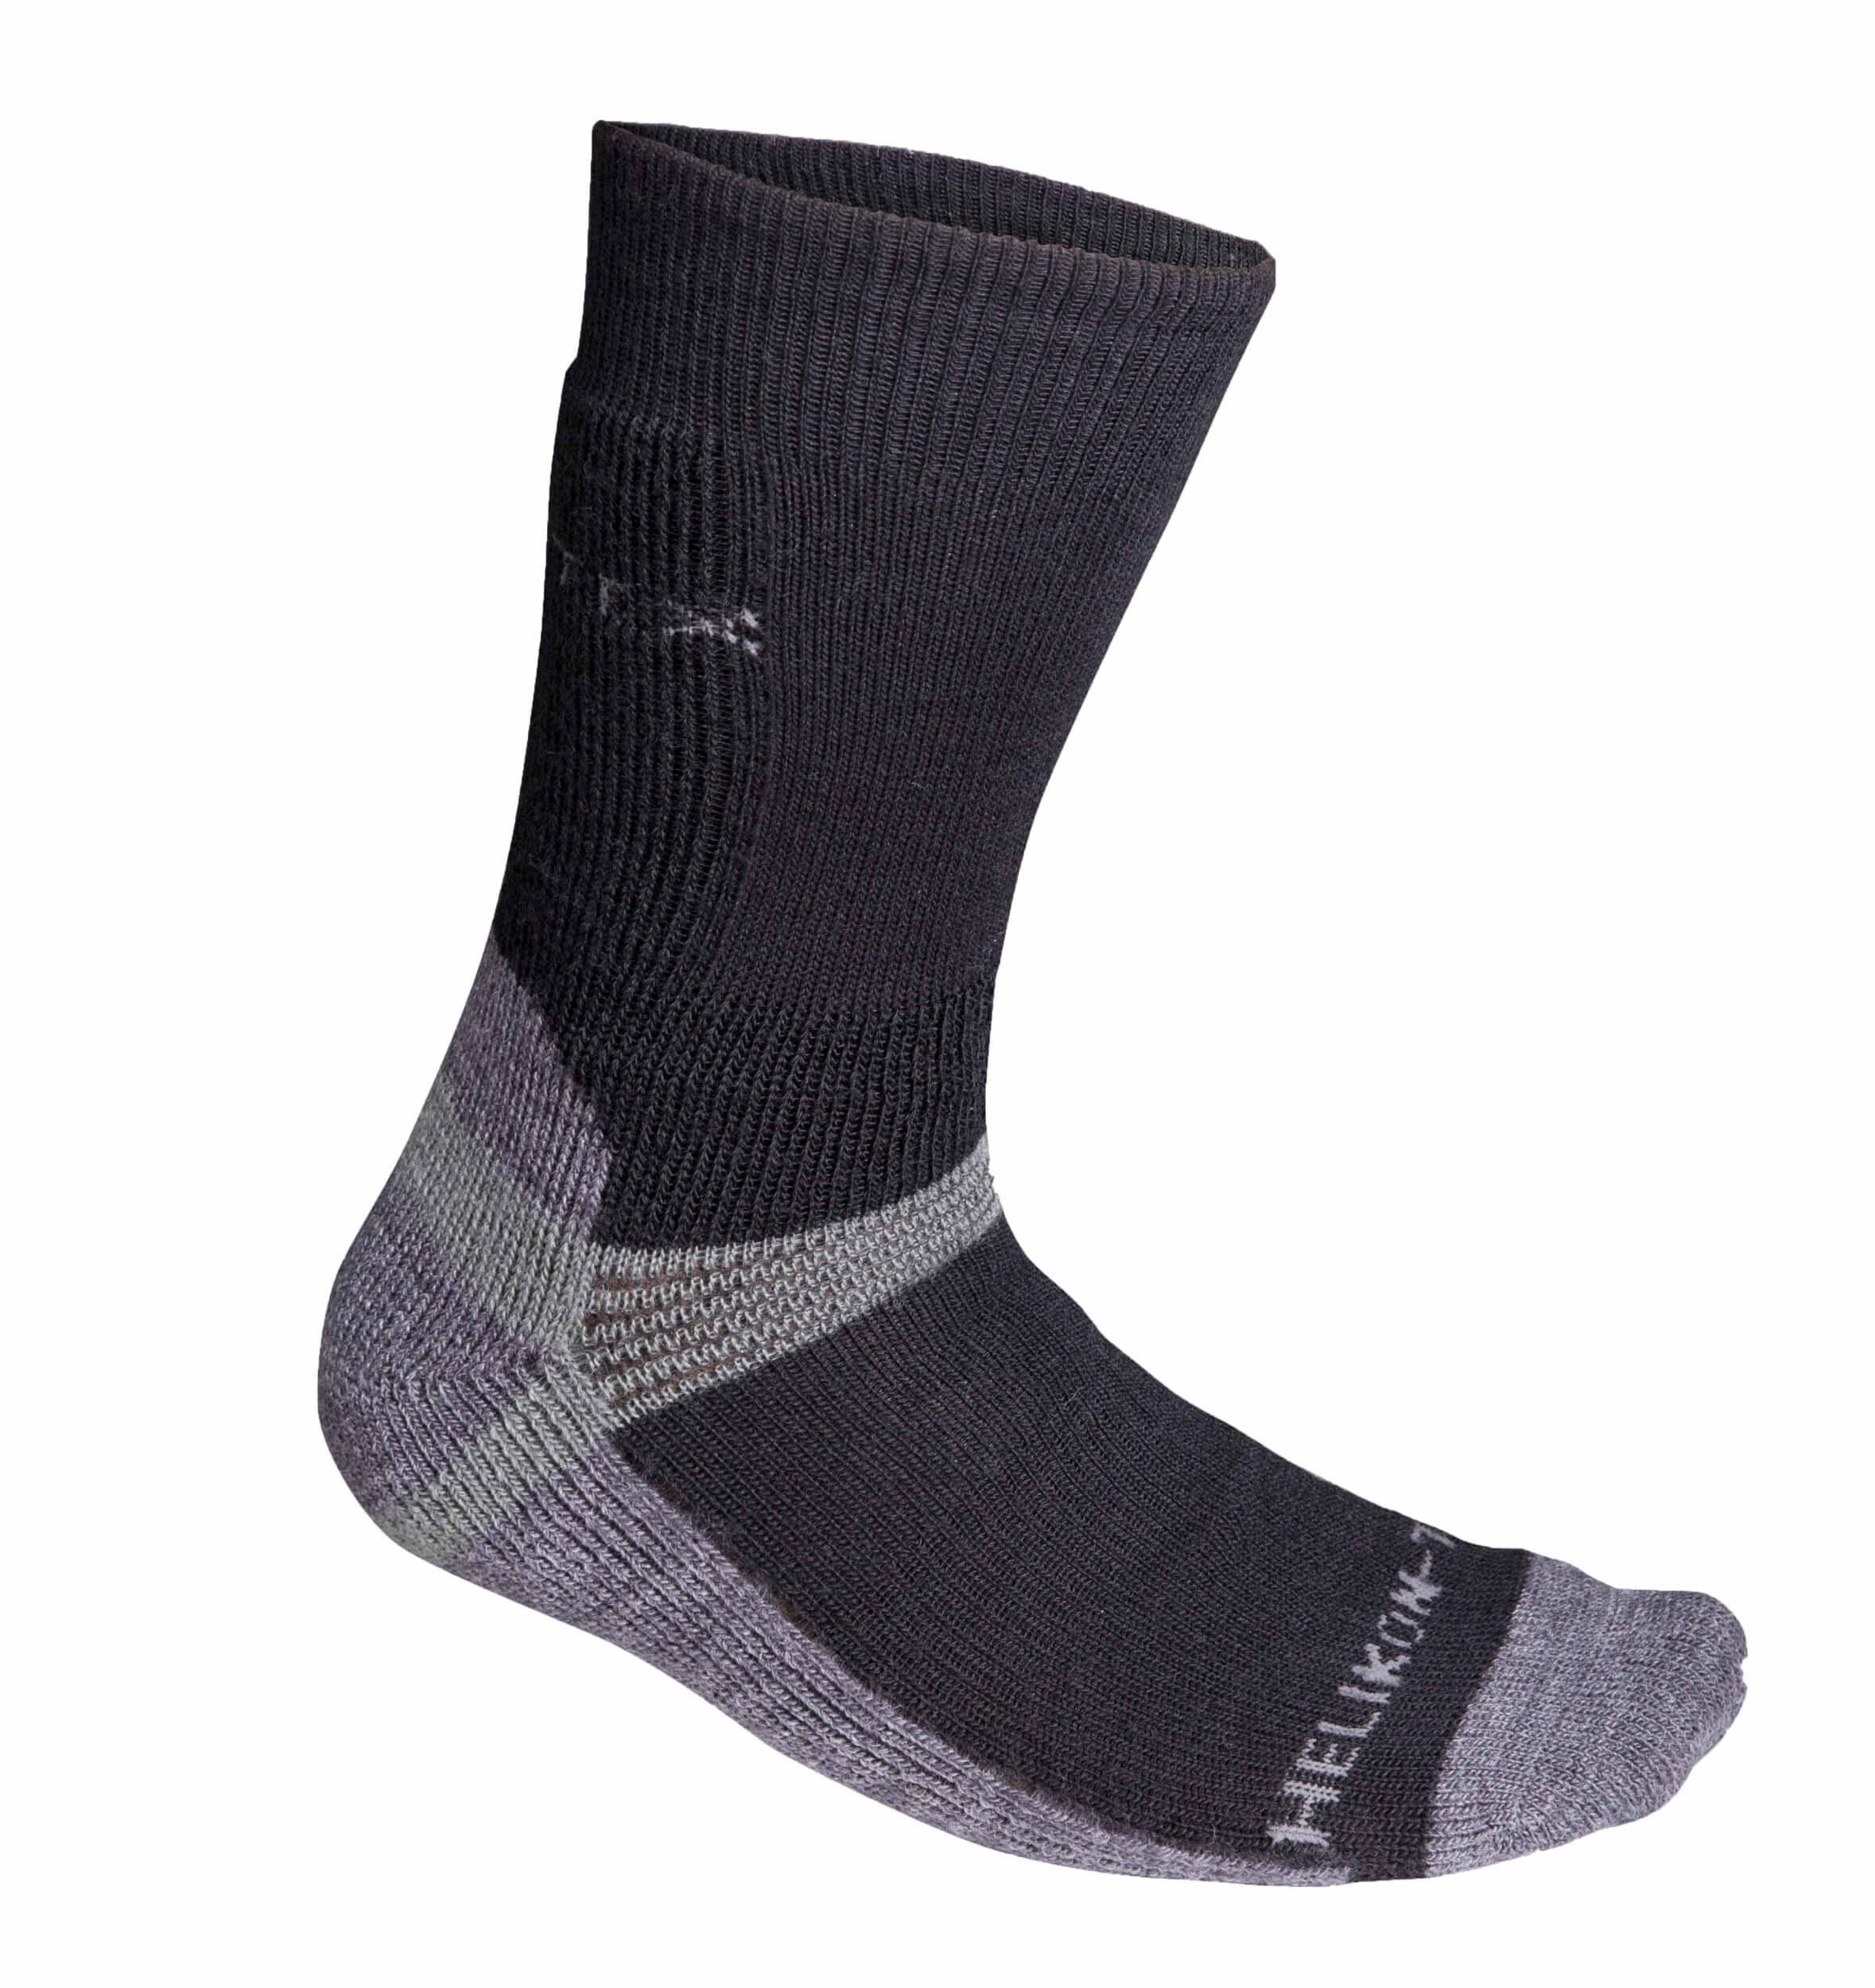 Helikon-Tex Heavyweight Socken - Schwarz